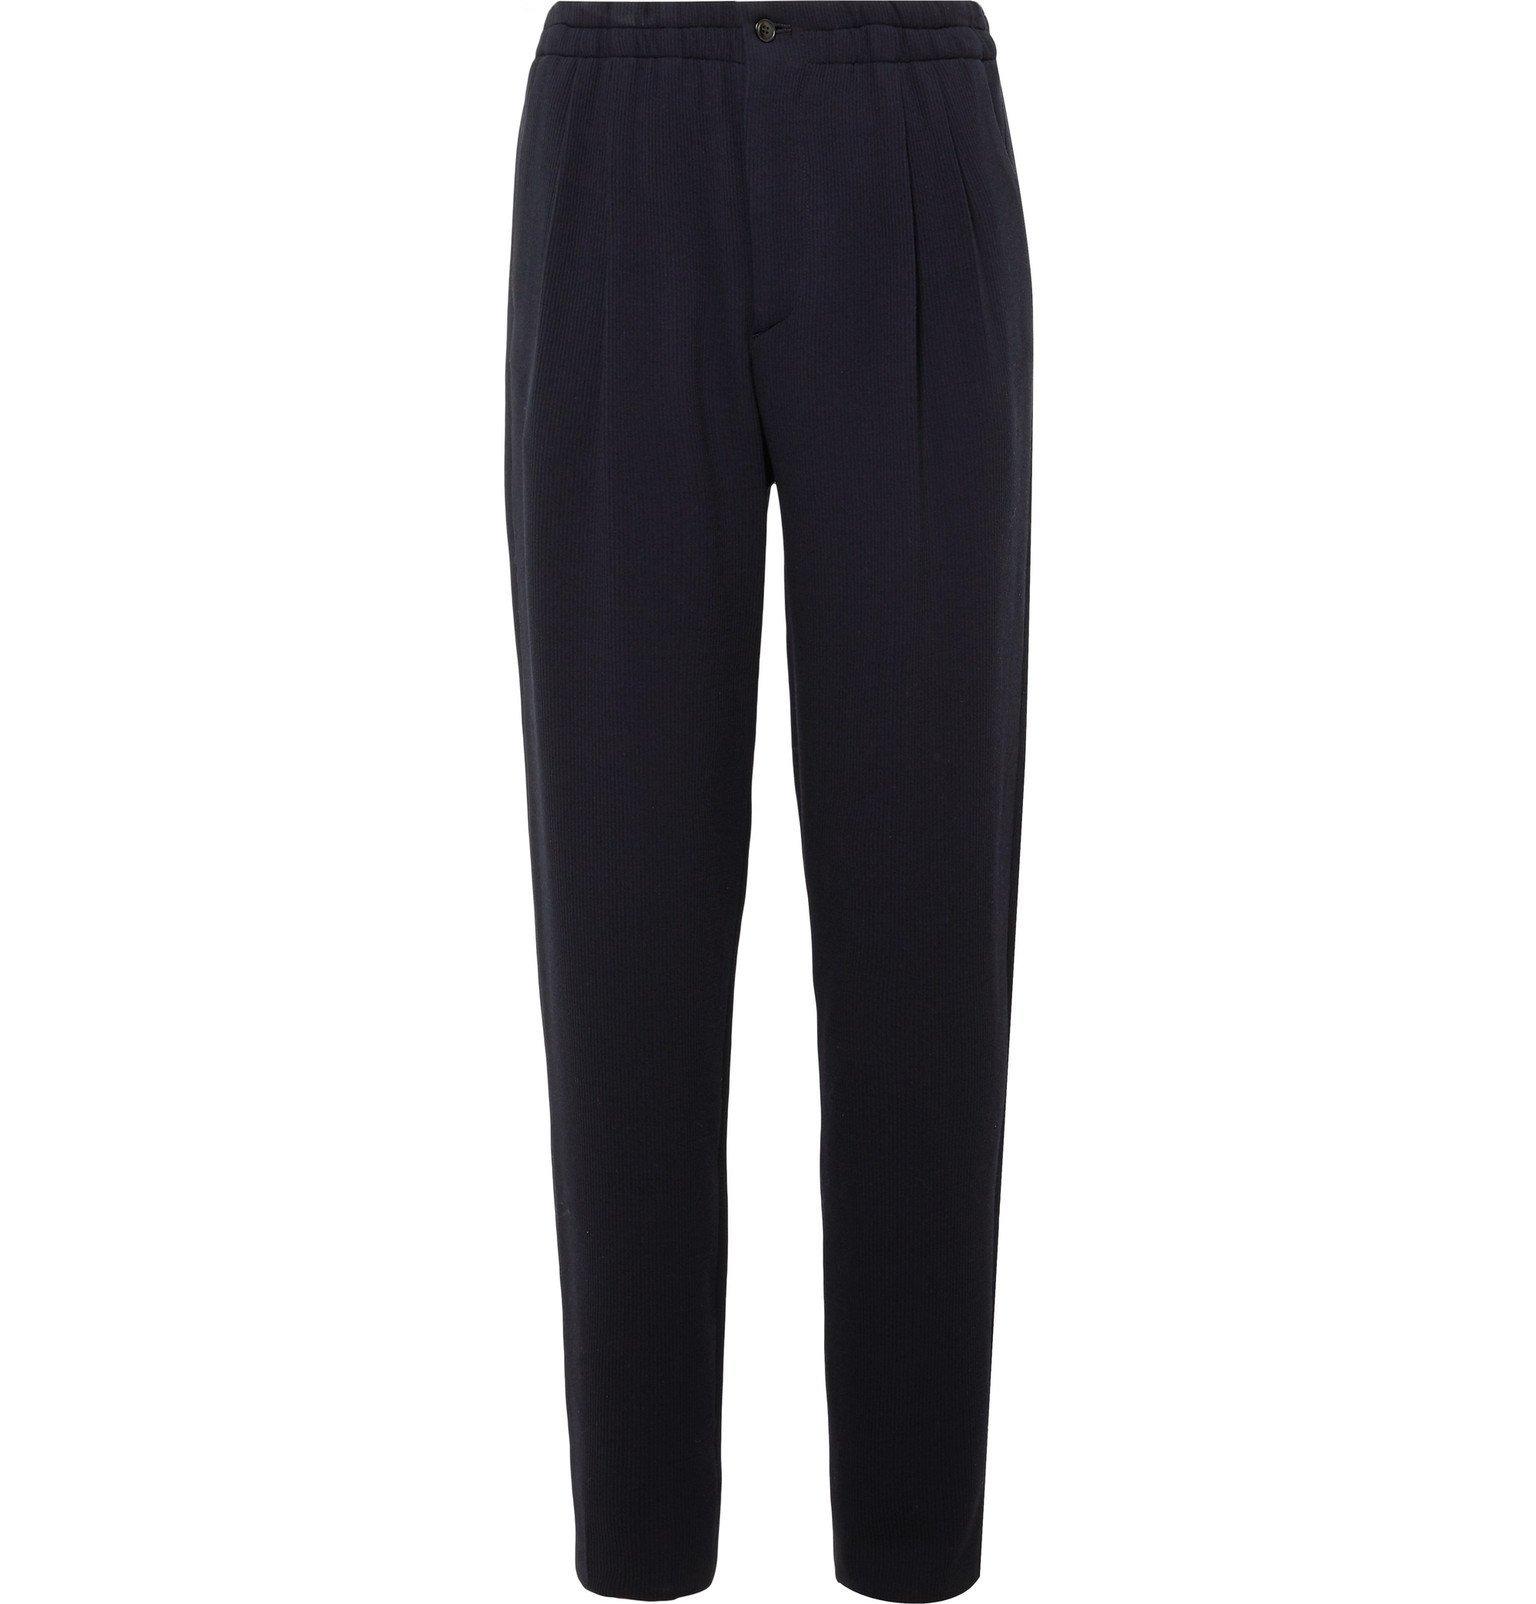 Giorgio Armani - Navy Pleated Virgin Wool-Blend Seersucker Suit Trousers - Blue